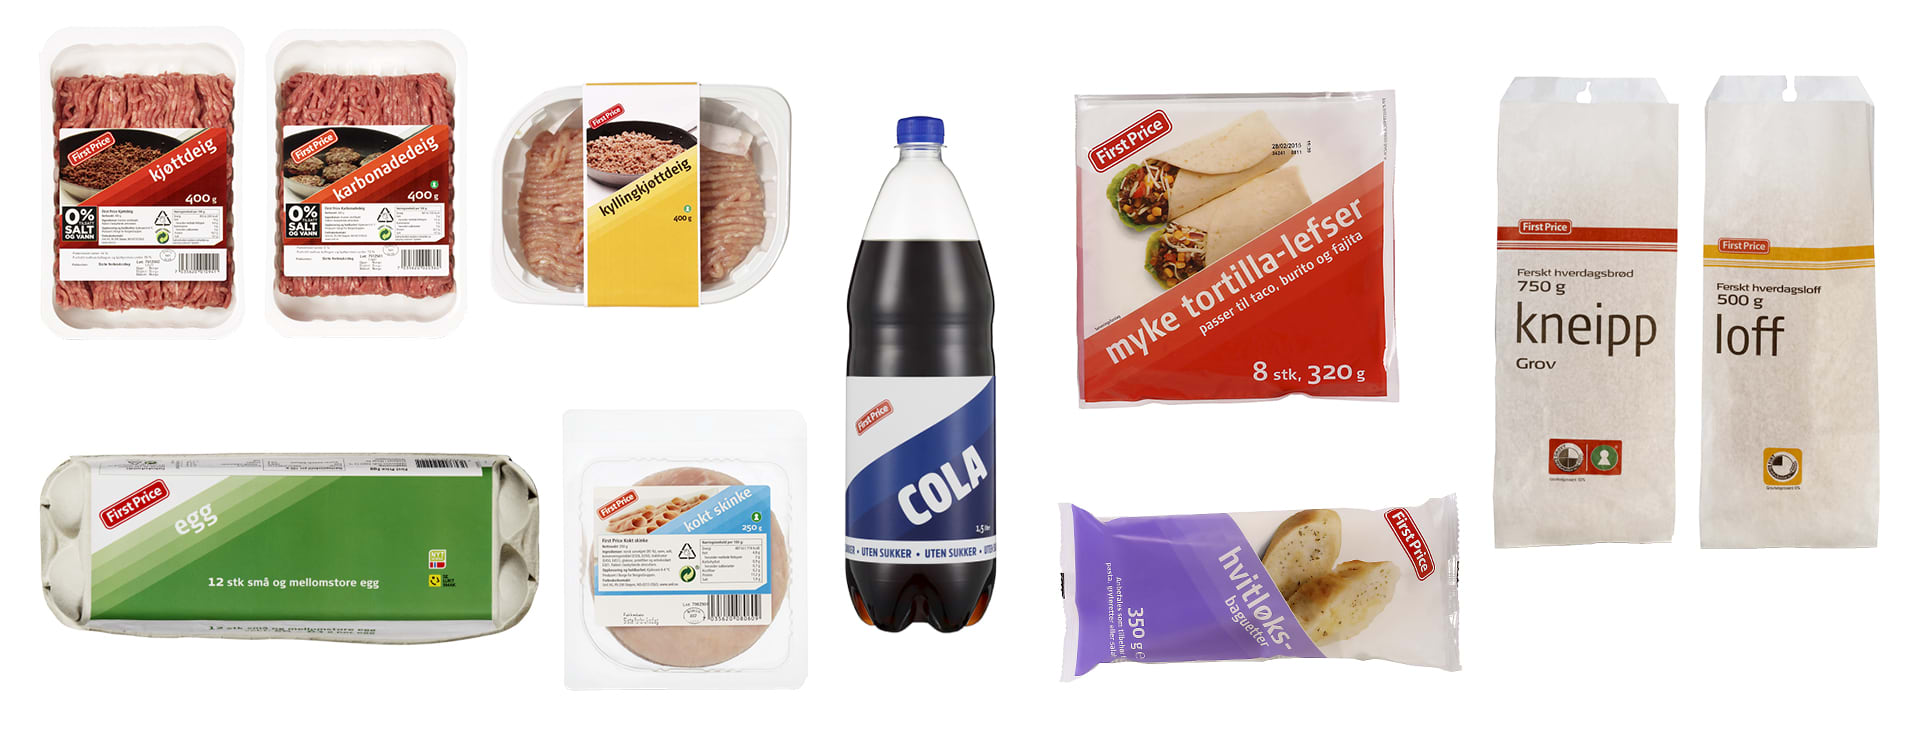 Dette er de ti mest solgte First Price-matvarene hos KIWI.